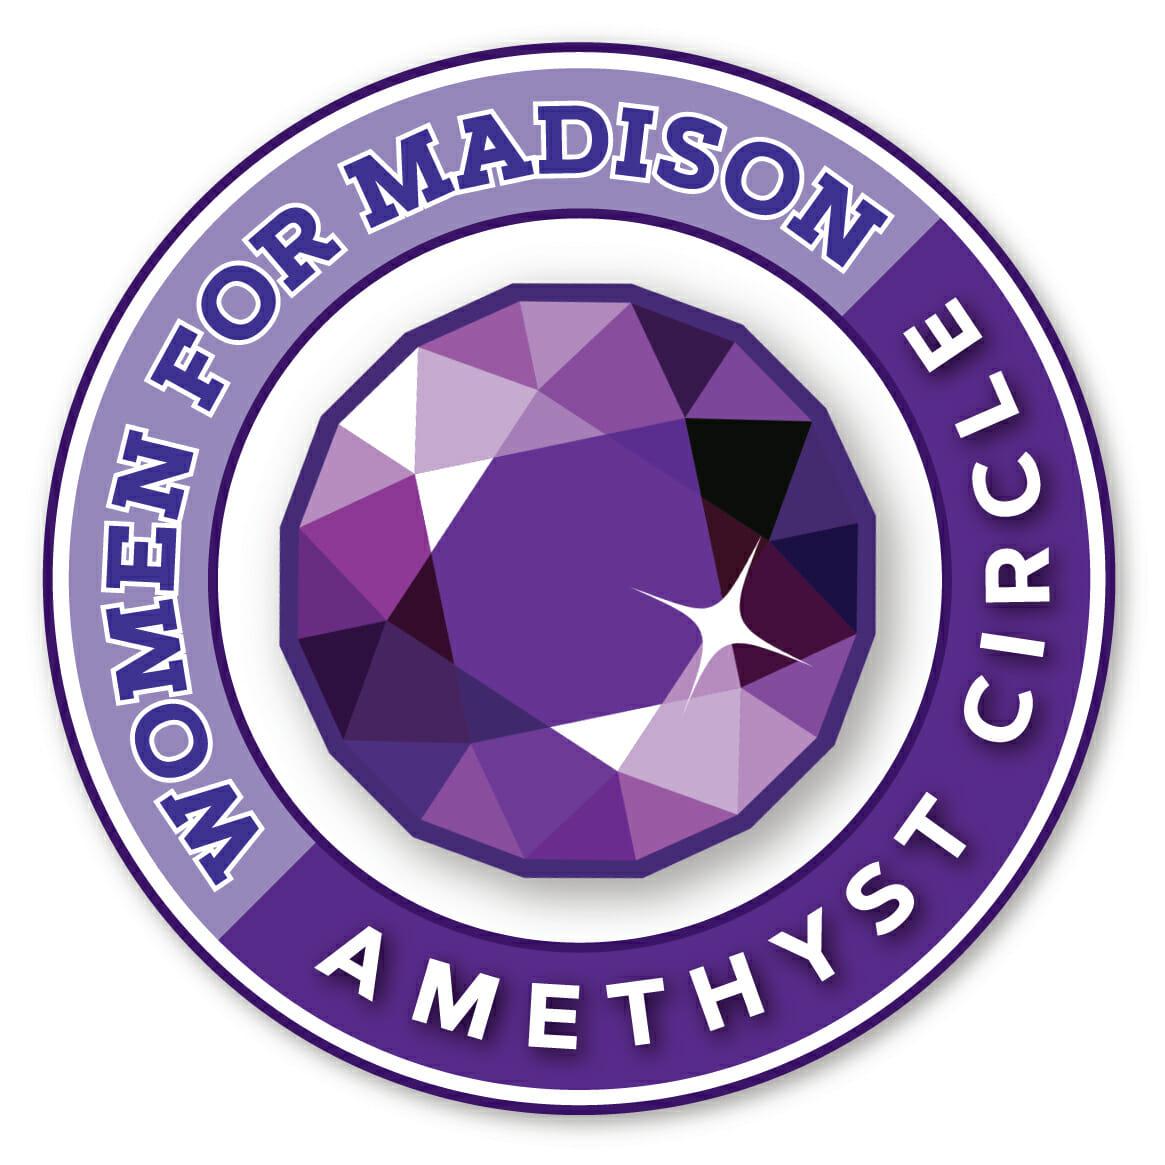 Women for Madison Amethyst Circle logo